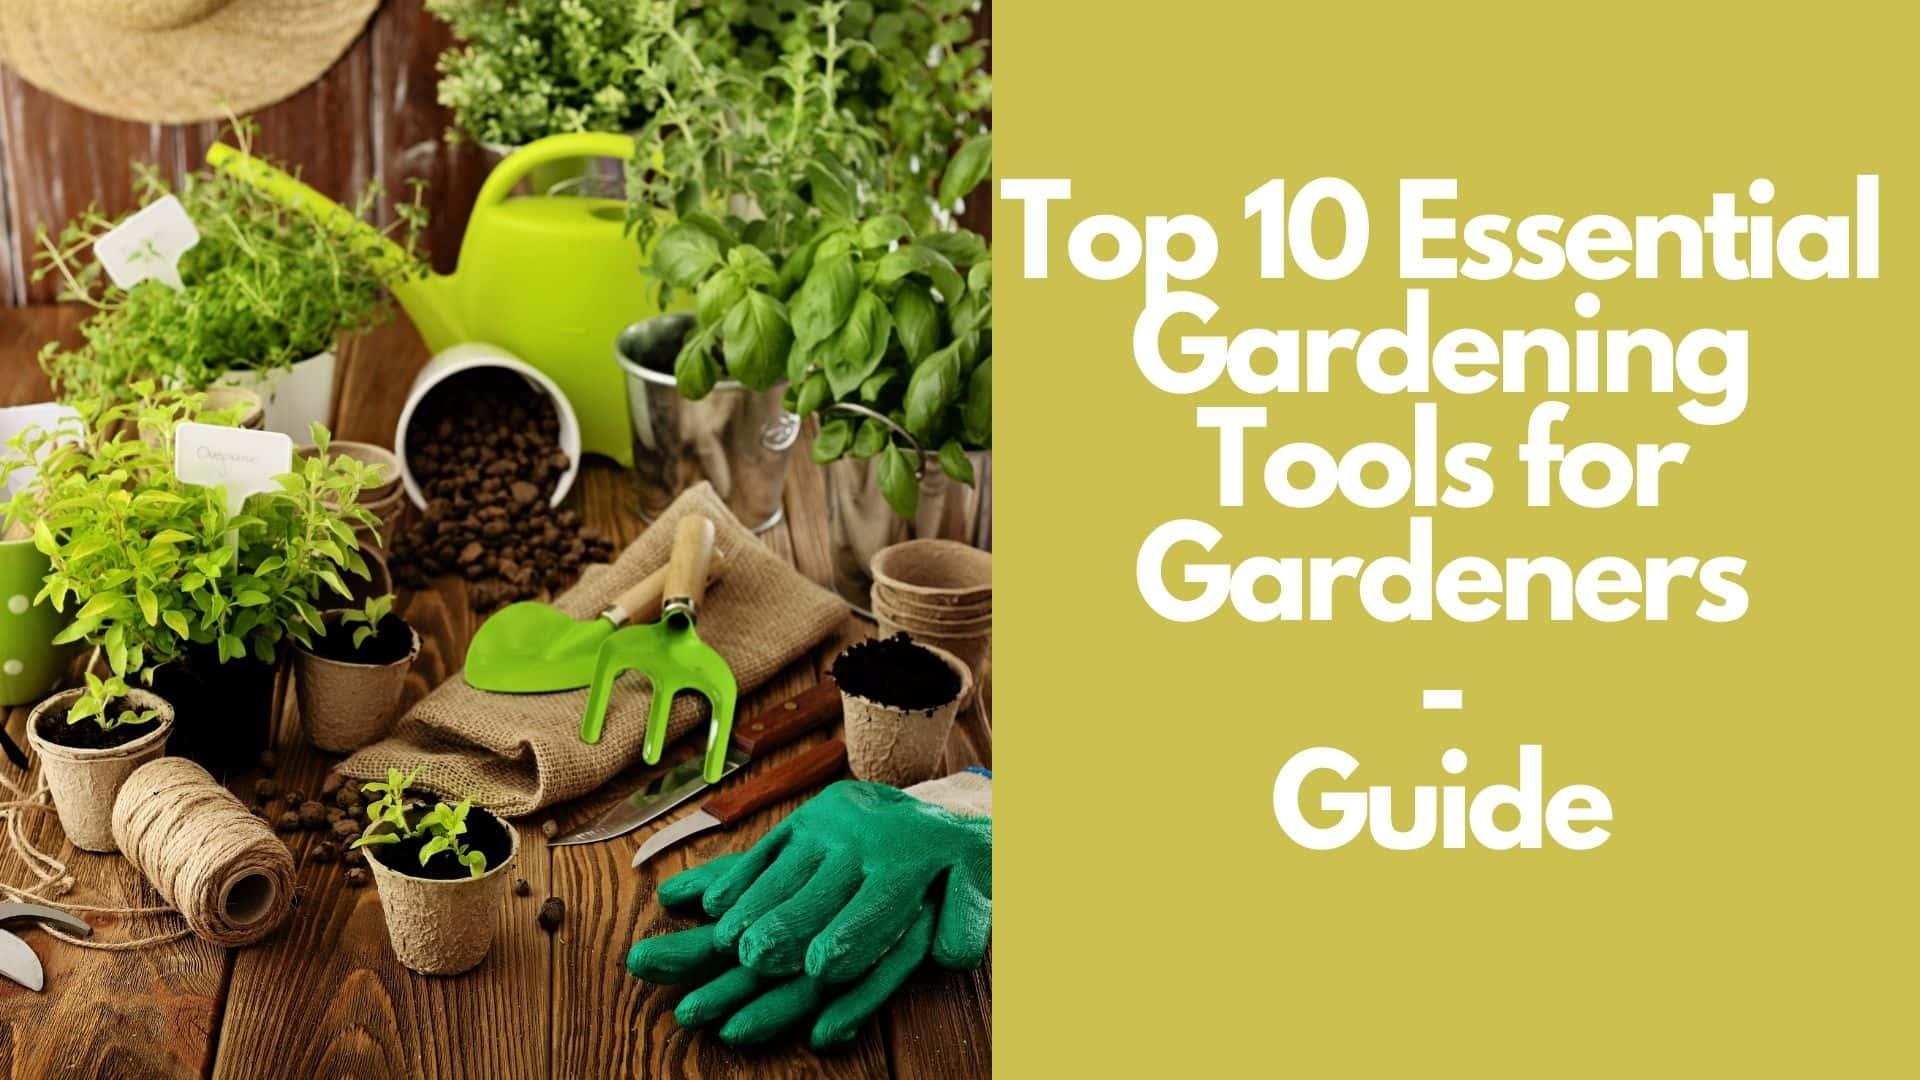 Top 10 Essential Gardening Tools for Gardeners  Guide